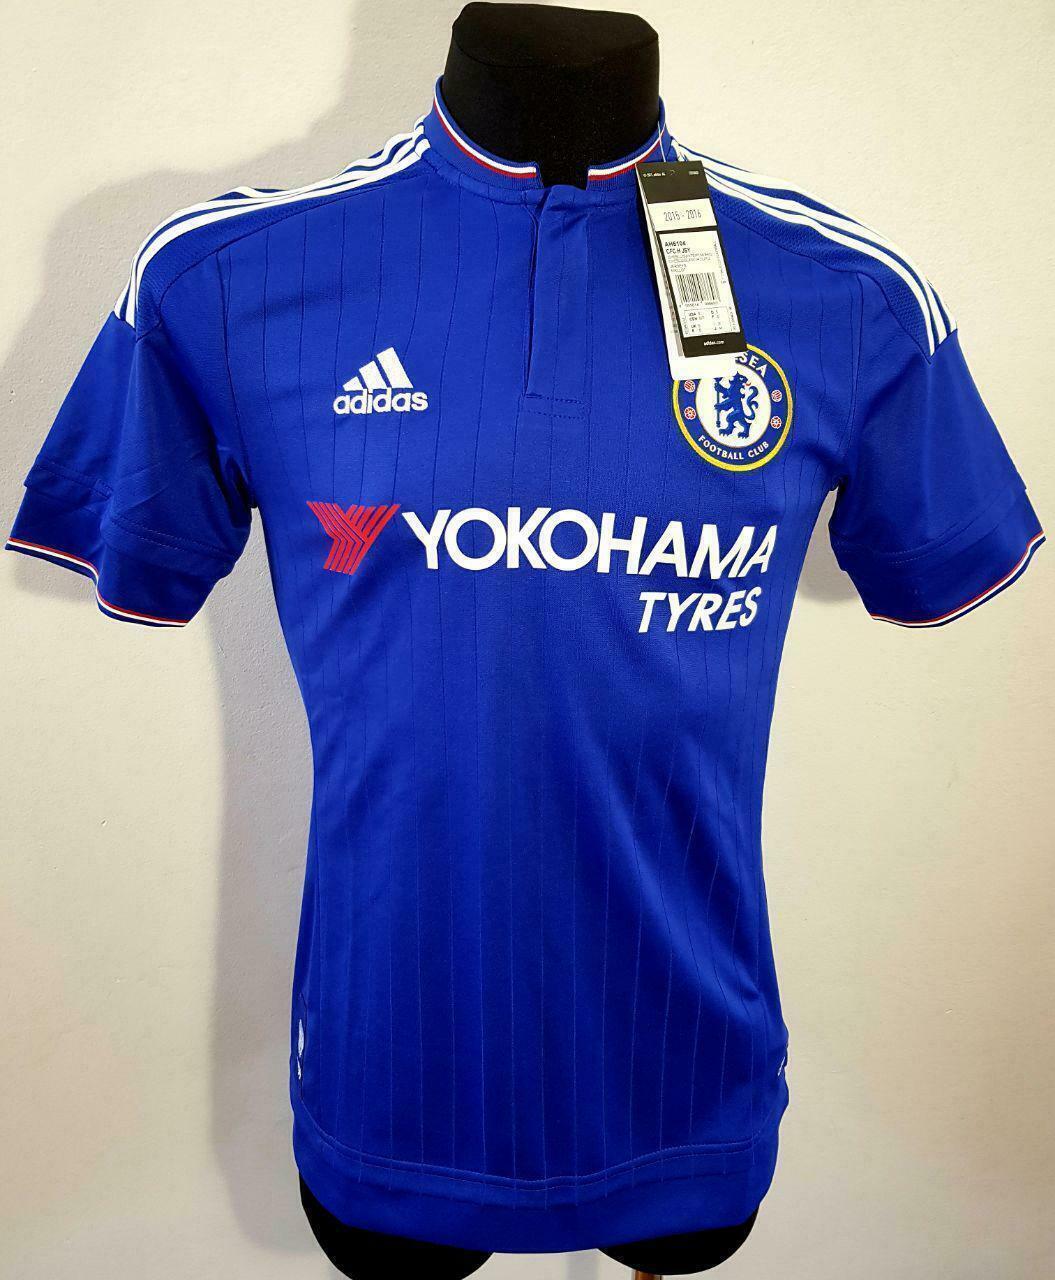 new concept 855f0 8cf50 Chelsea London Home Football Shirt Jersey 2015 - 2016 adidas XXL